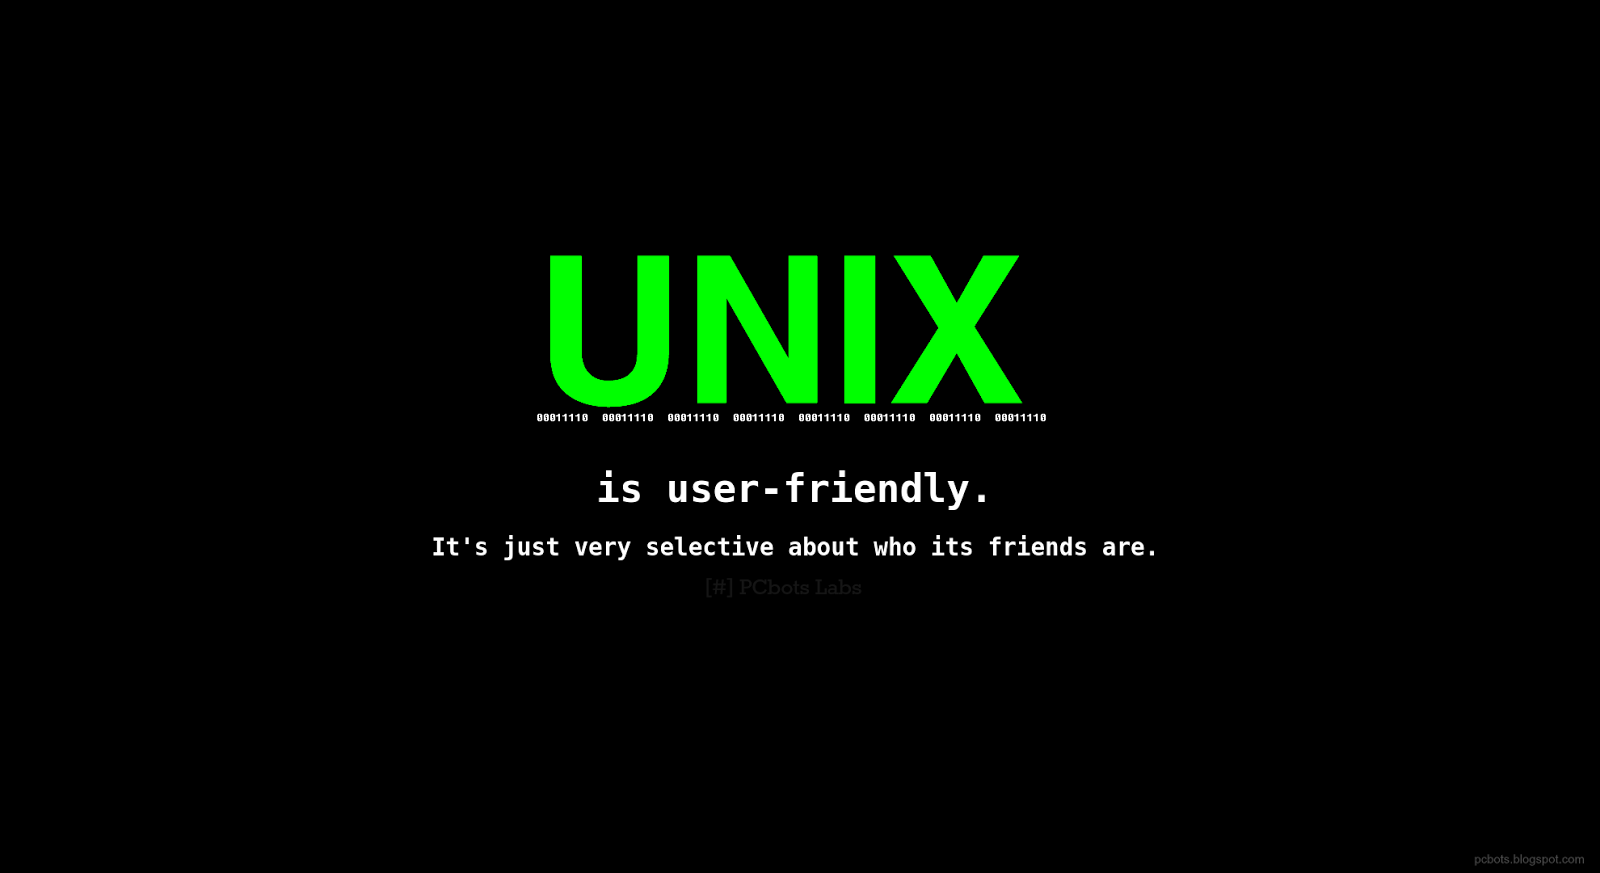 Hacker Iphone Wallpaper Linux Hd Wallpapers Backtrack Ubuntu Unix Redhat By